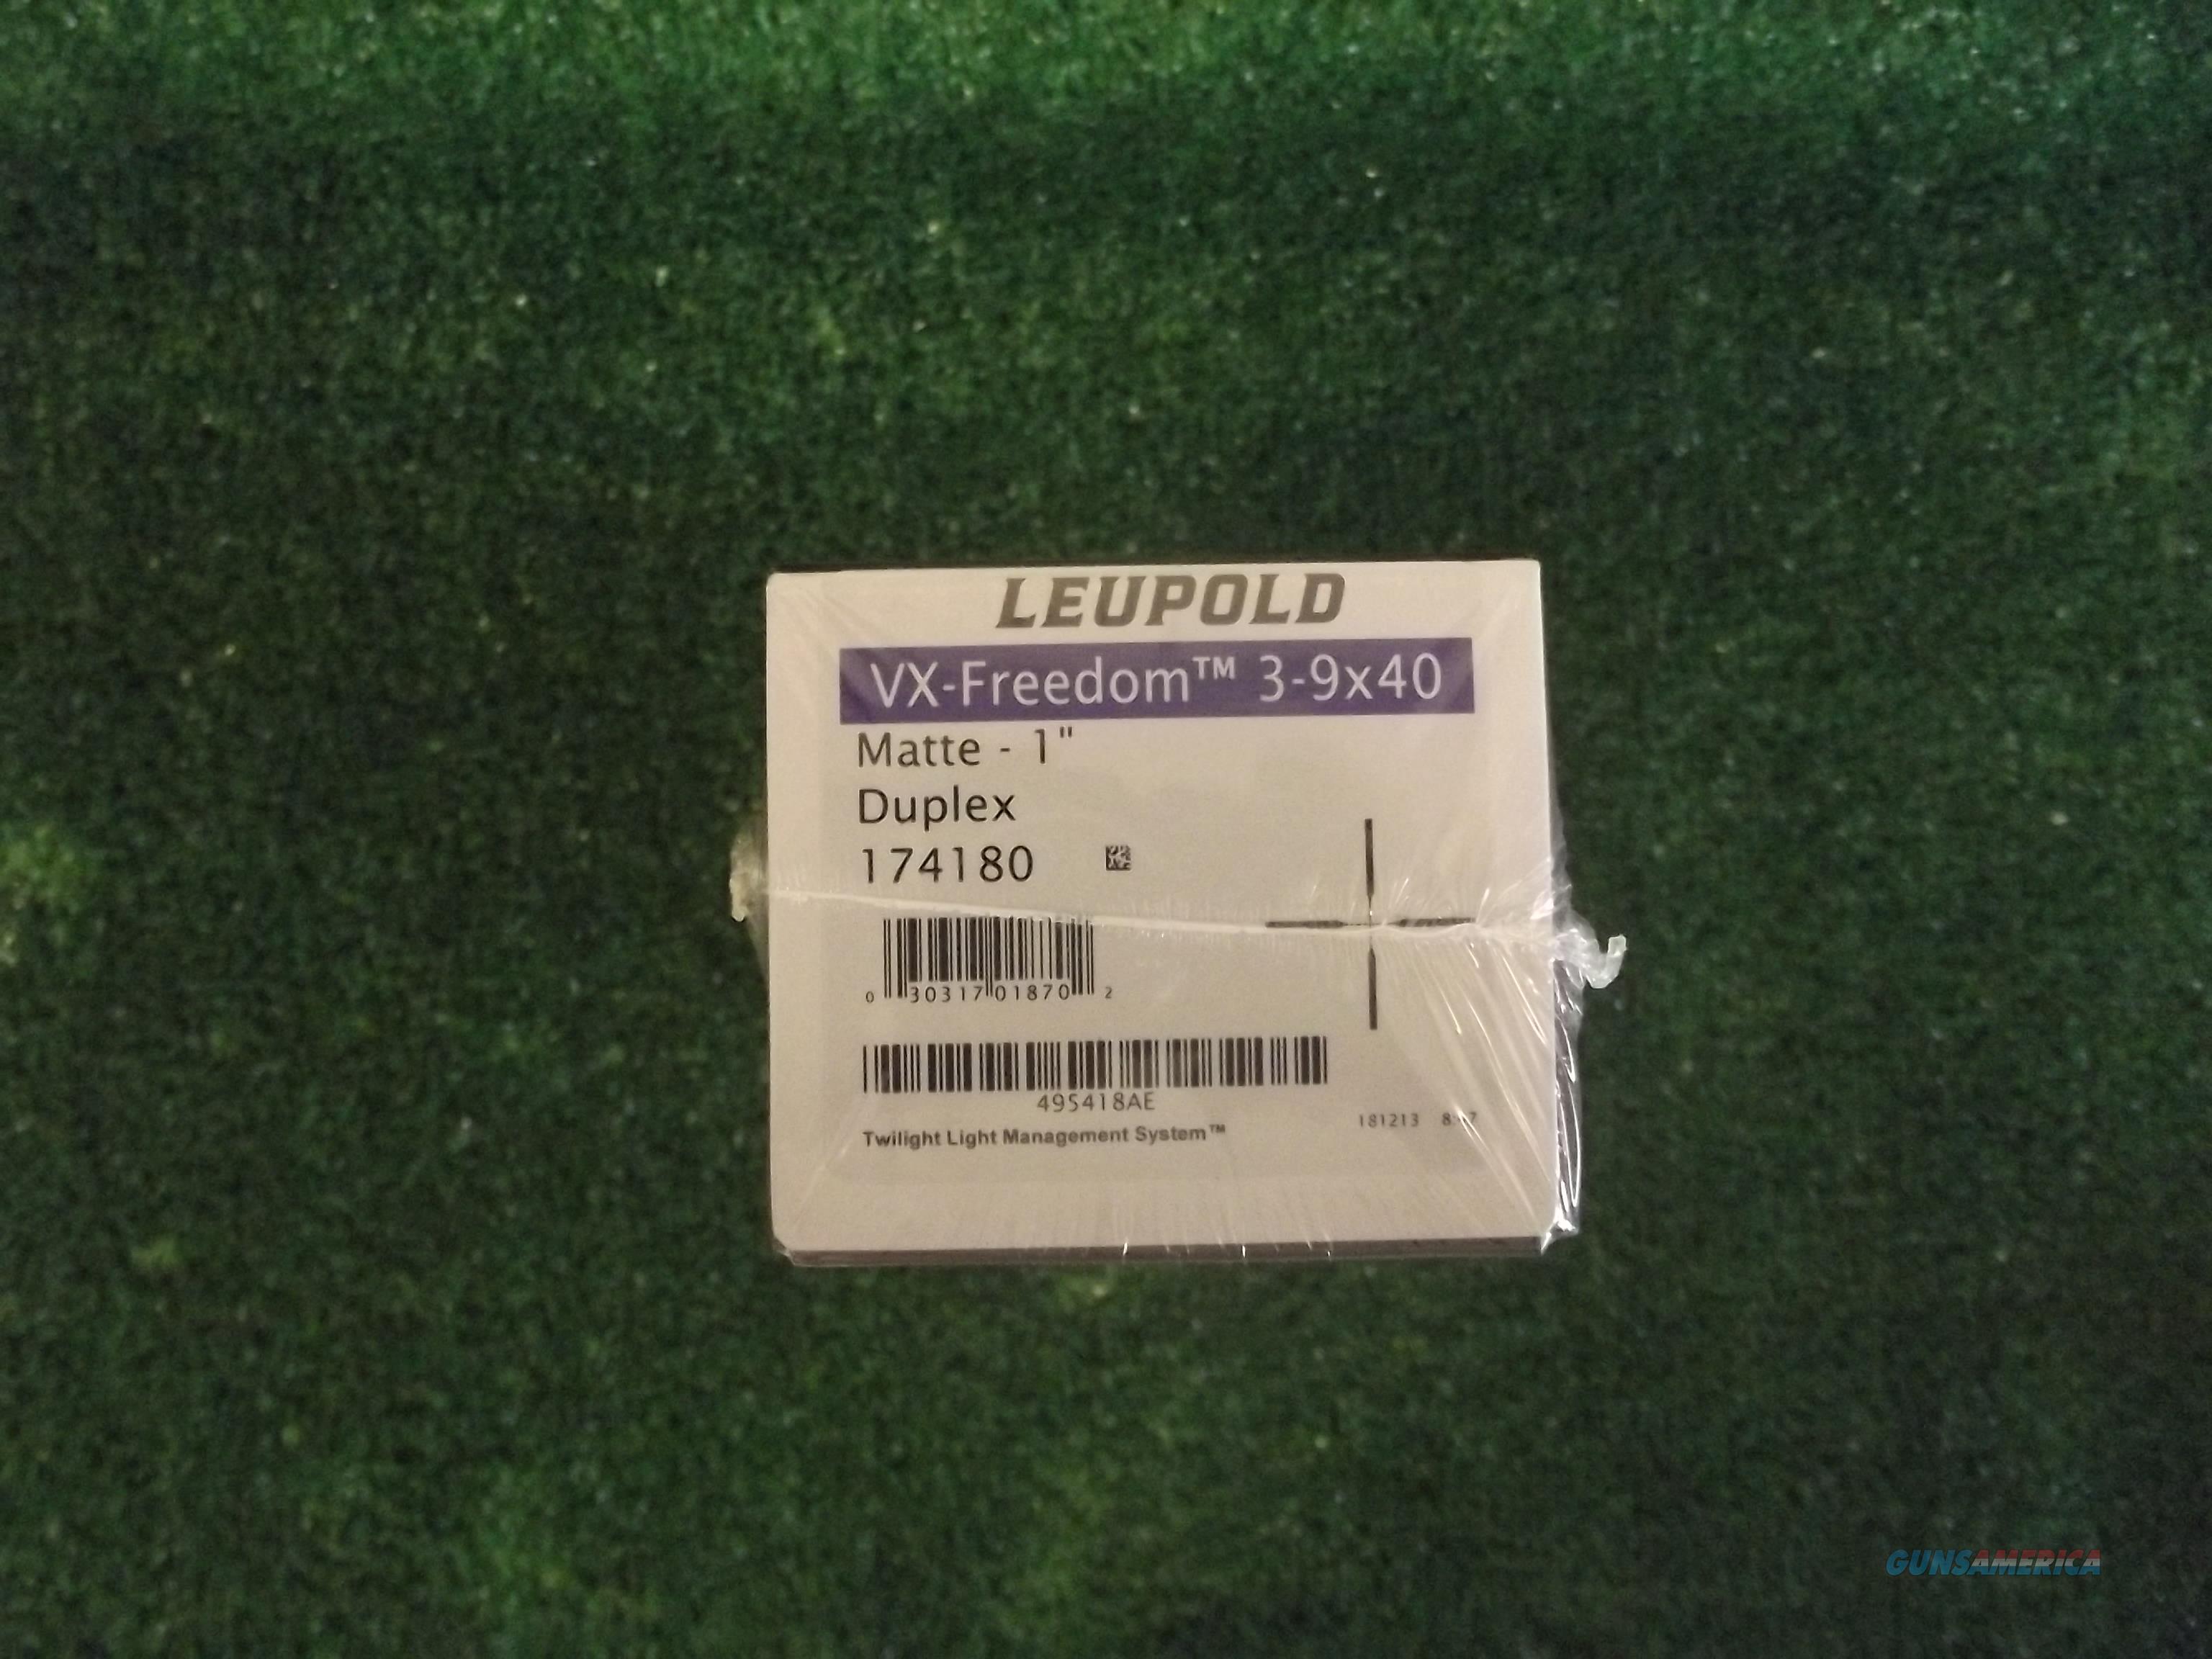 Leupold VX-Freedom 3-9x40 Duplex  Non-Guns > Scopes/Mounts/Rings & Optics > Rifle Scopes > Variable Focal Length